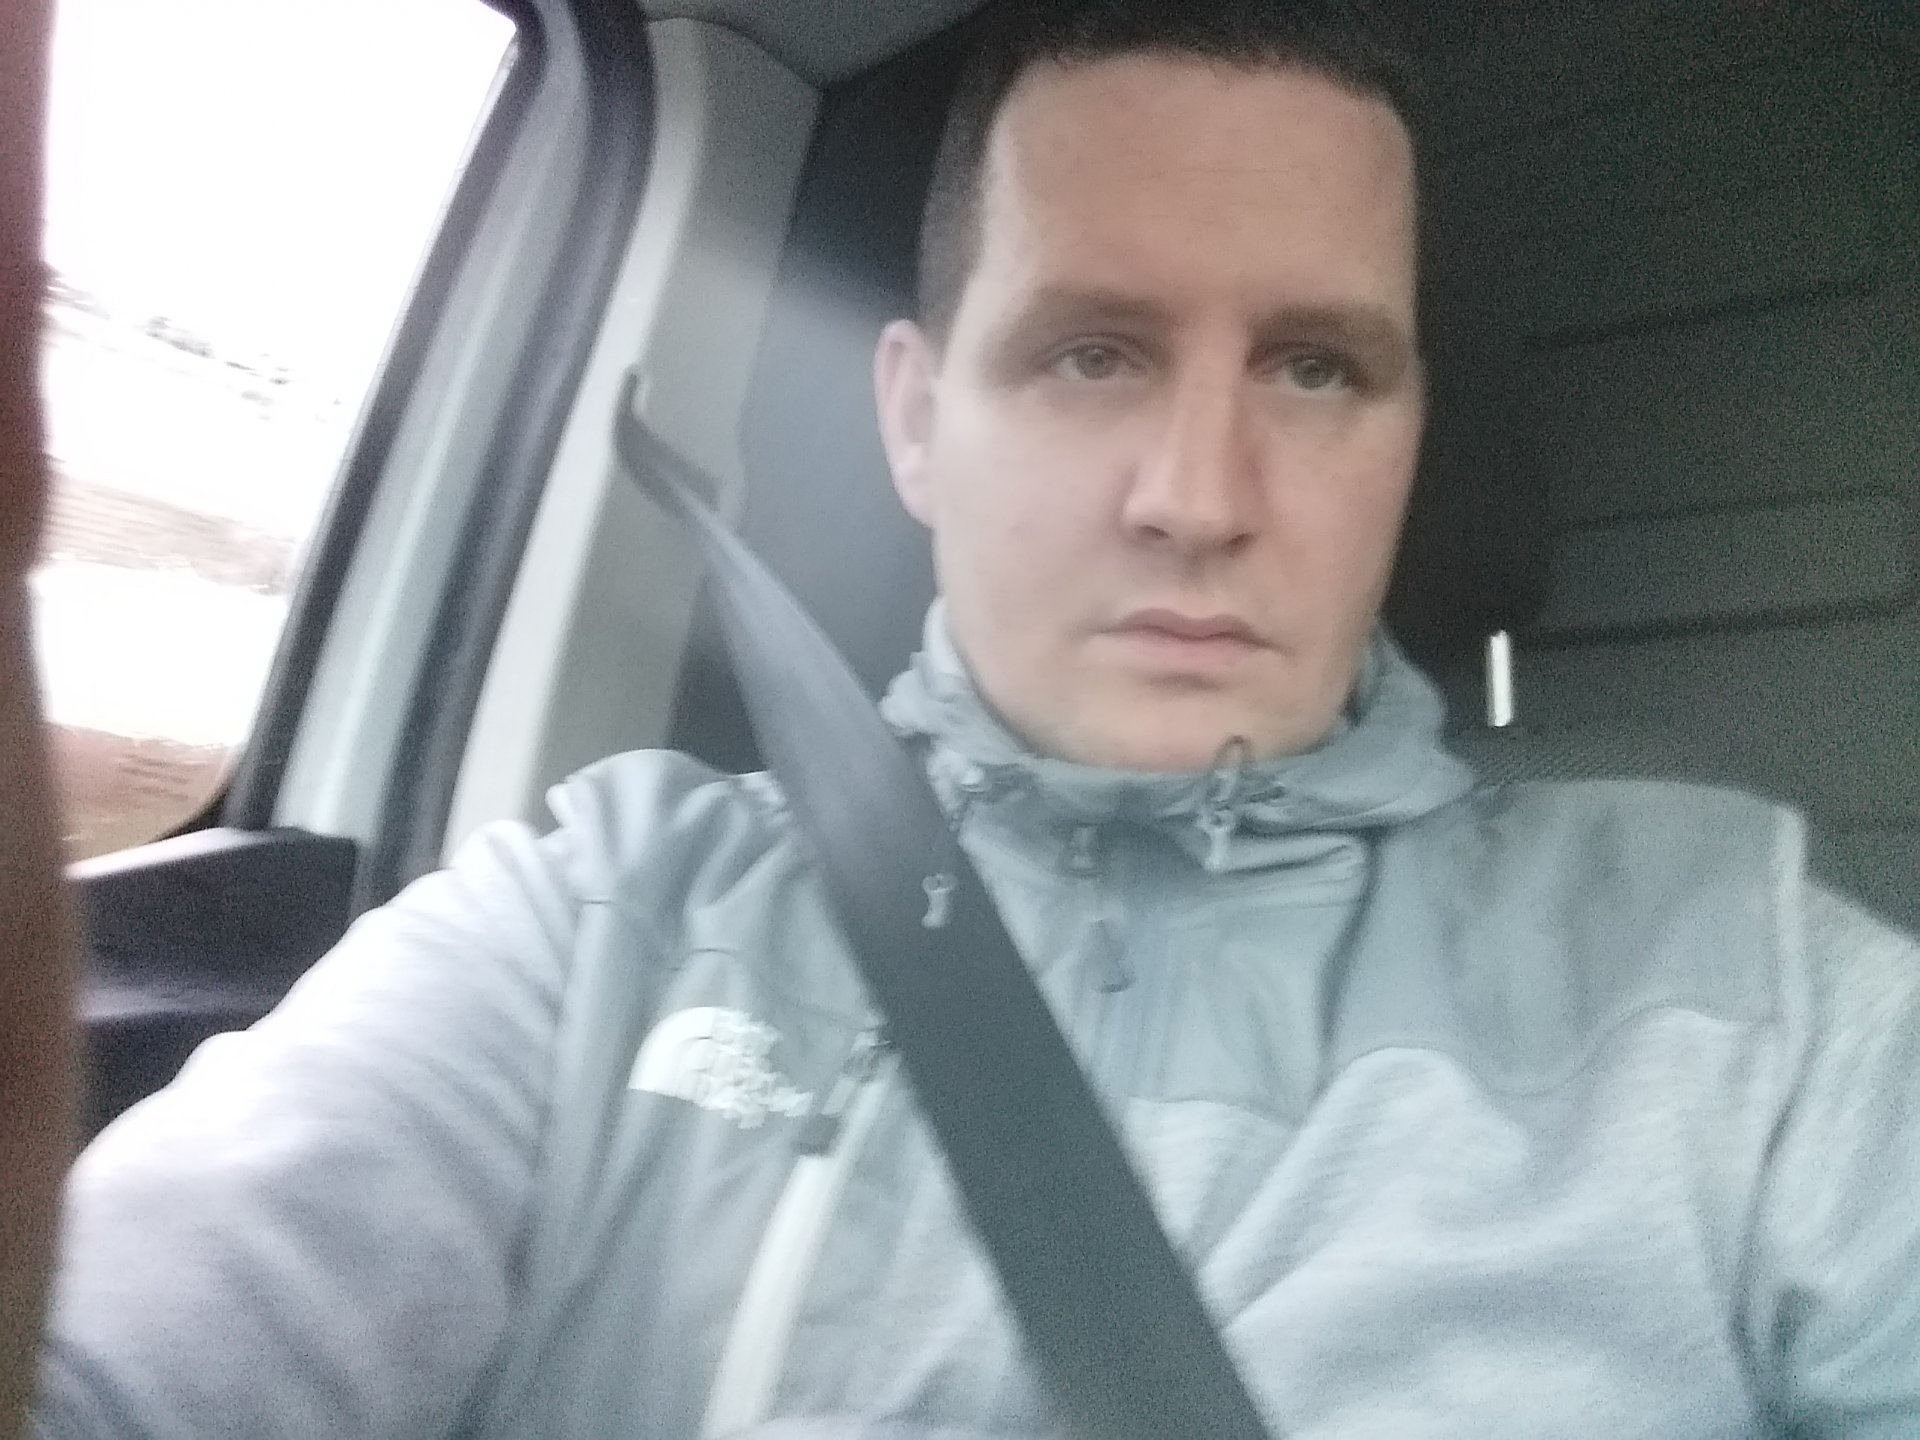 Seanpaul26 from North Tyneside,United Kingdom